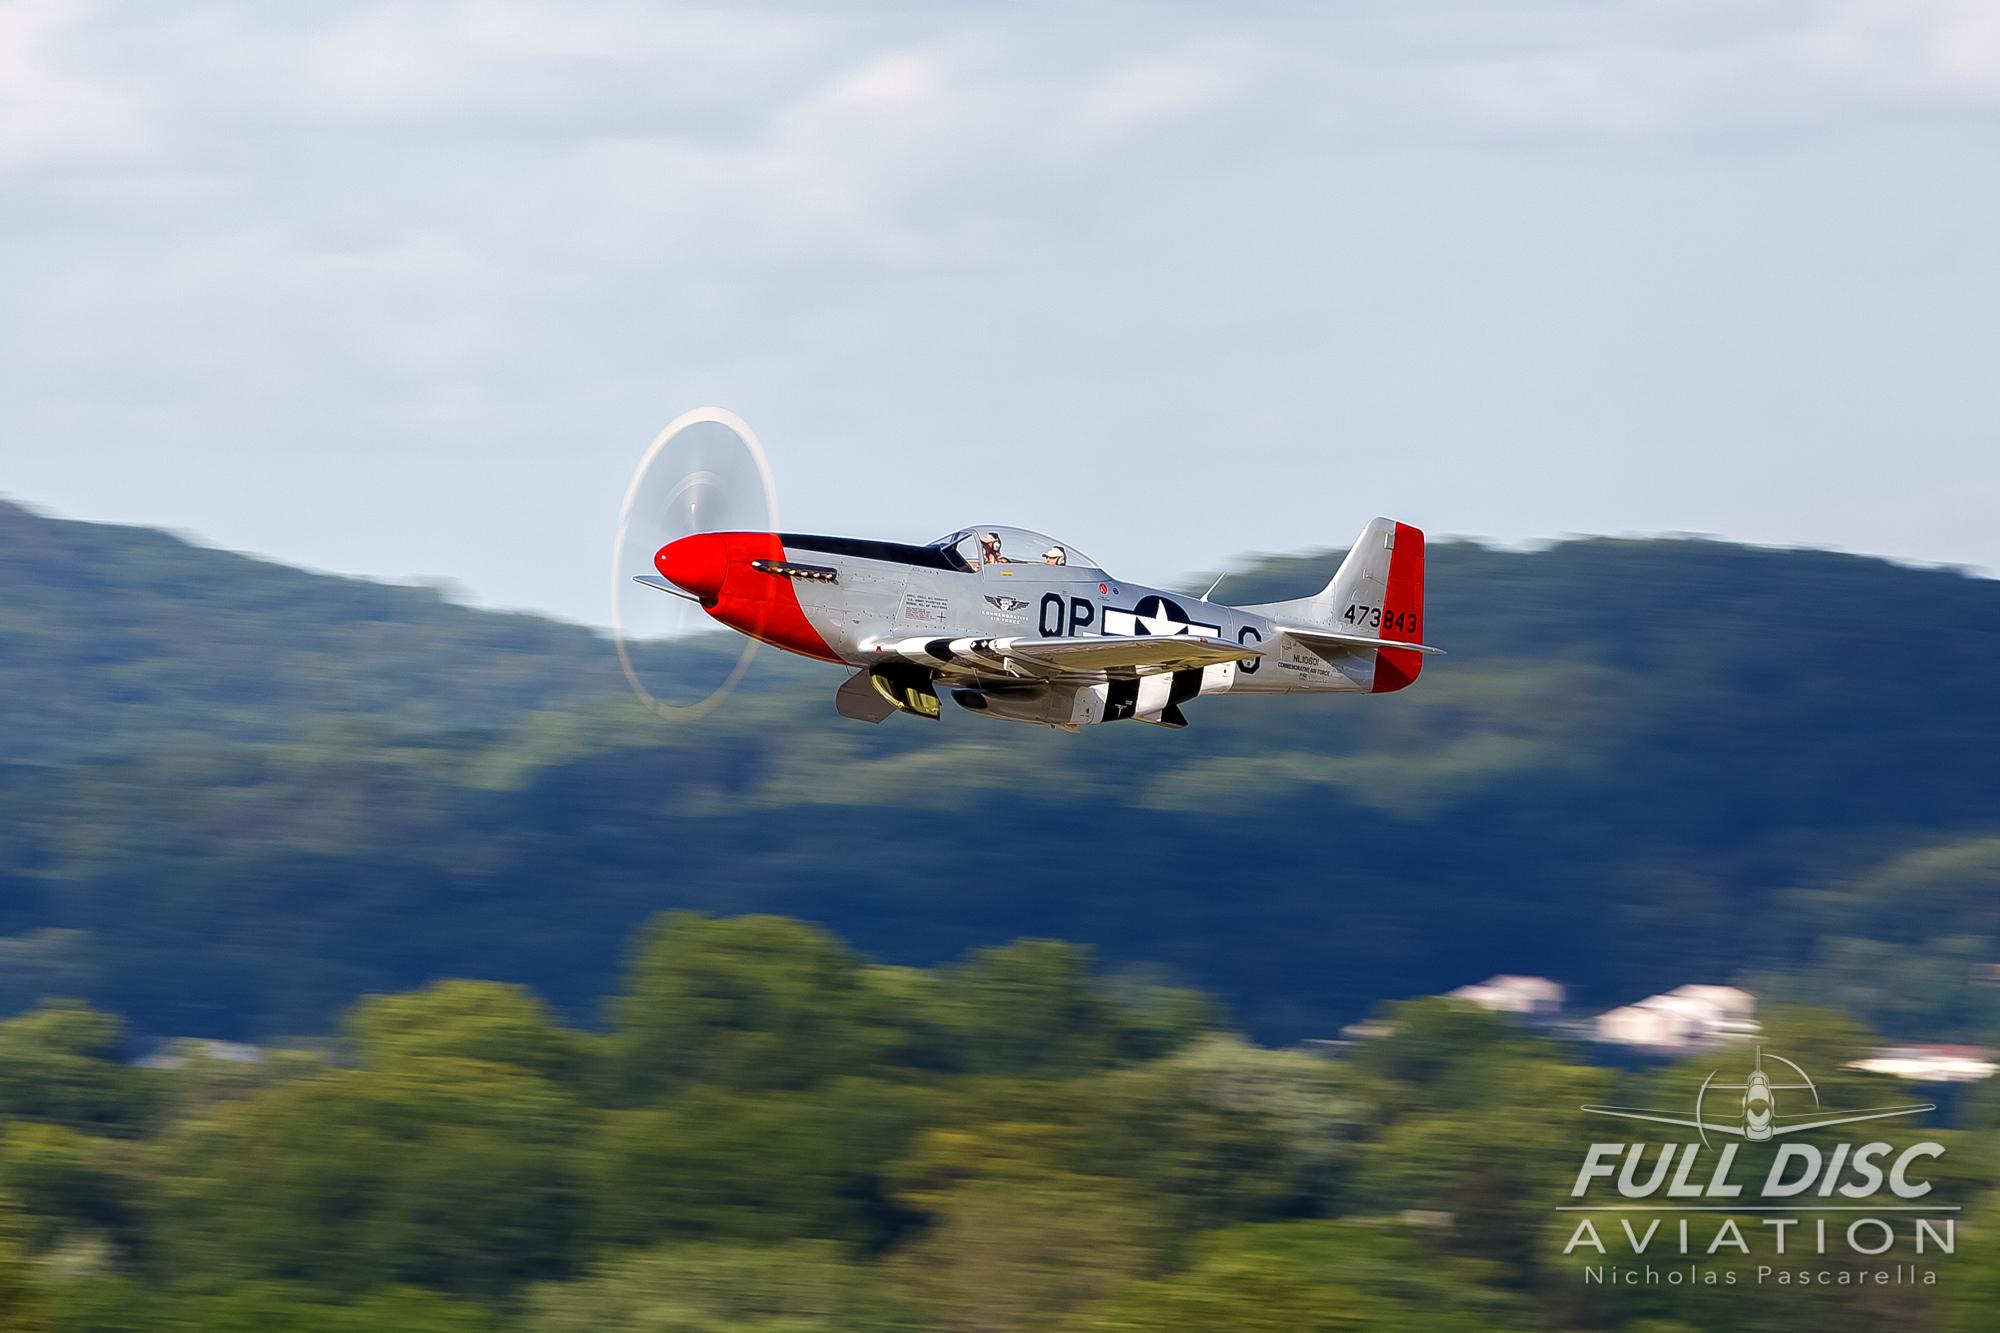 nickpascarella_nicholaspascarella_fulldiscaviation_aircraft_mustang_rednose_takeoff_wwiiweekend.jpg